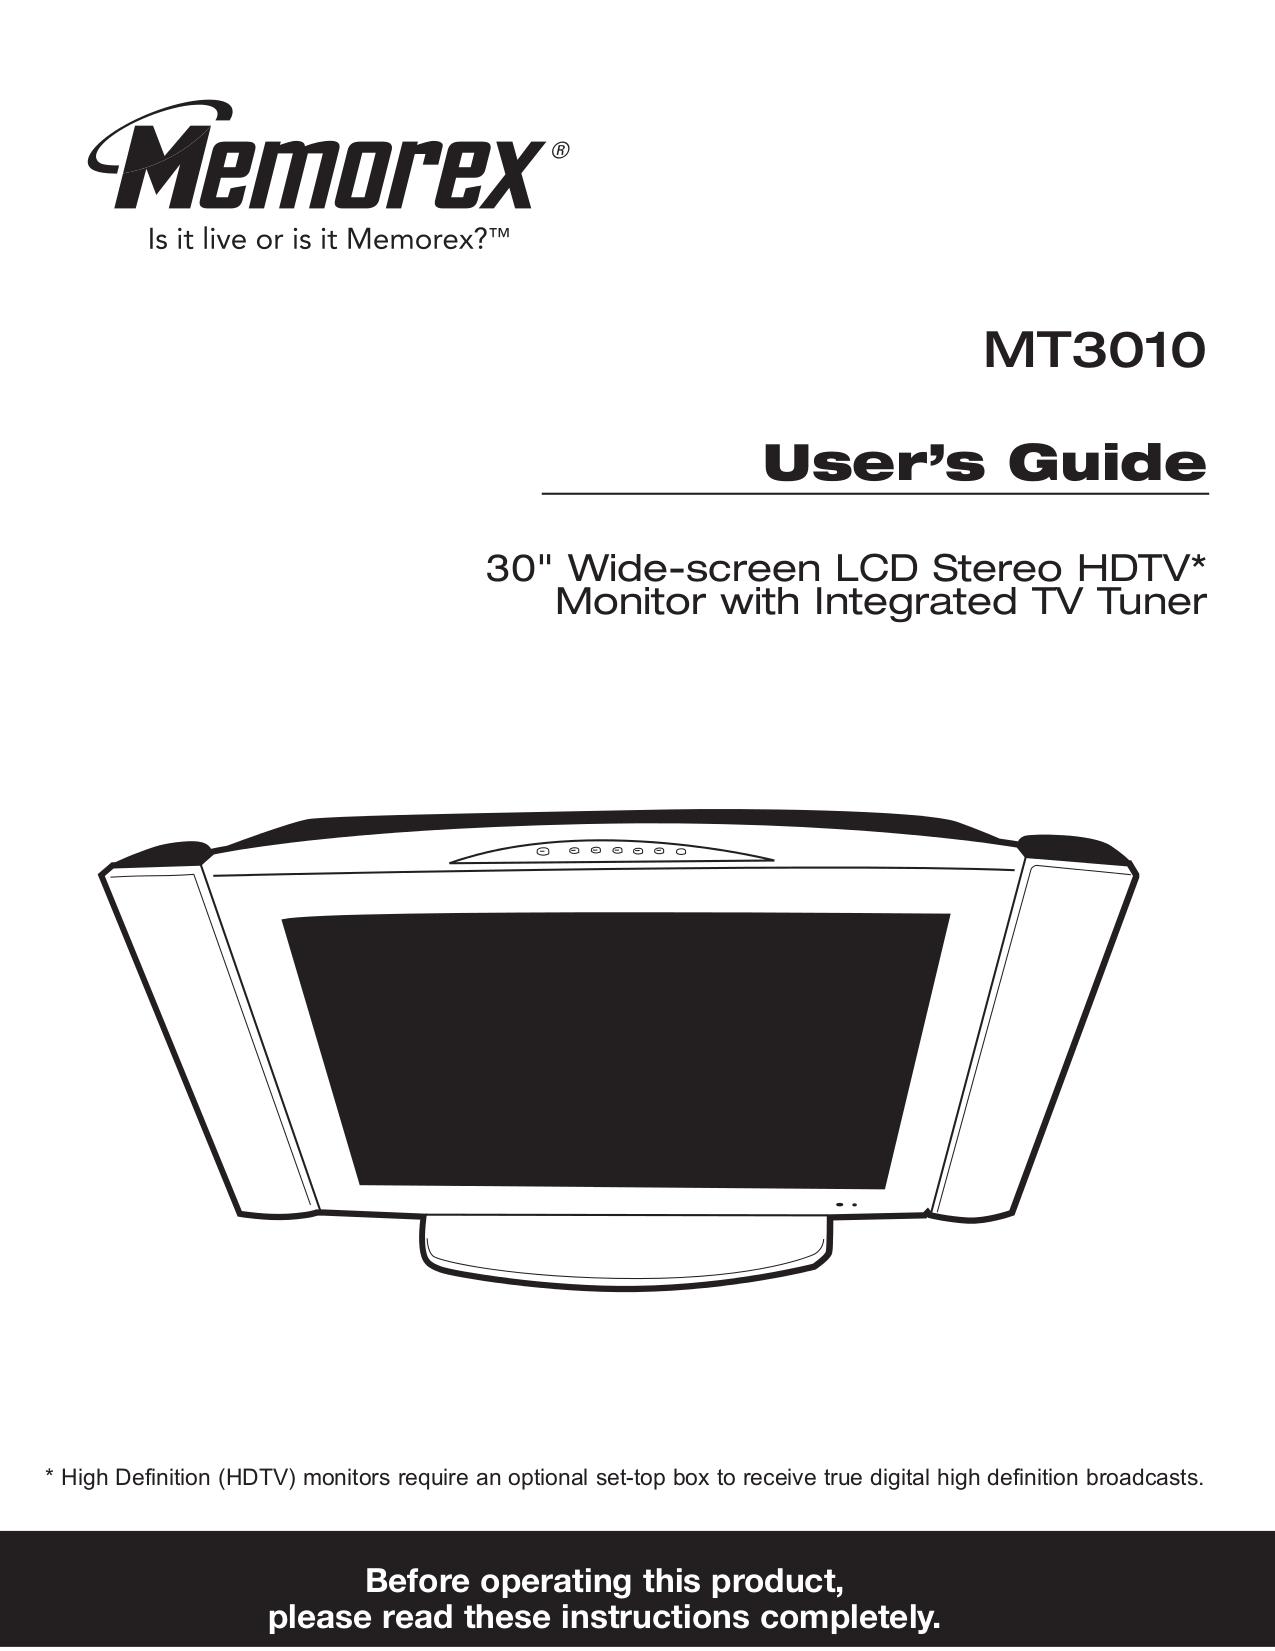 memorex tv manual online user manual u2022 rh pandadigital co Canon Digital Camera Manual Pentax Camera Manual